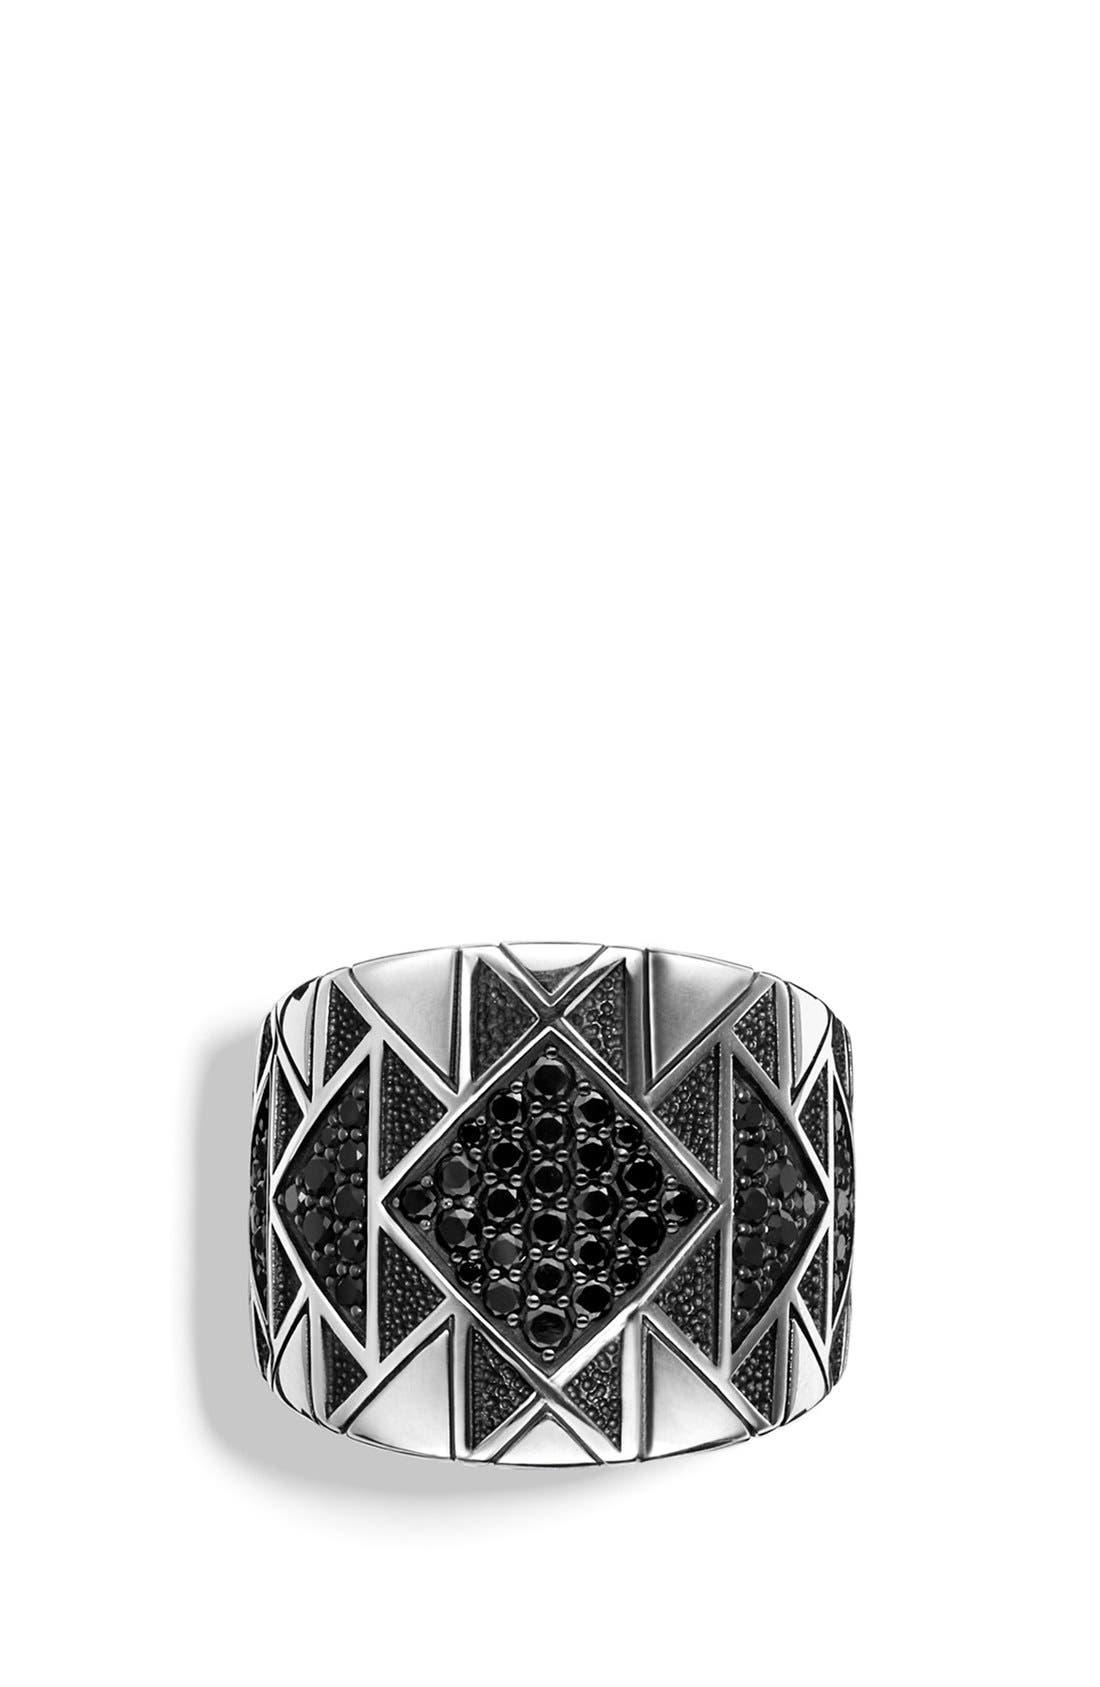 Southwest Signet Ring with Black Diamonds,                             Alternate thumbnail 4, color,